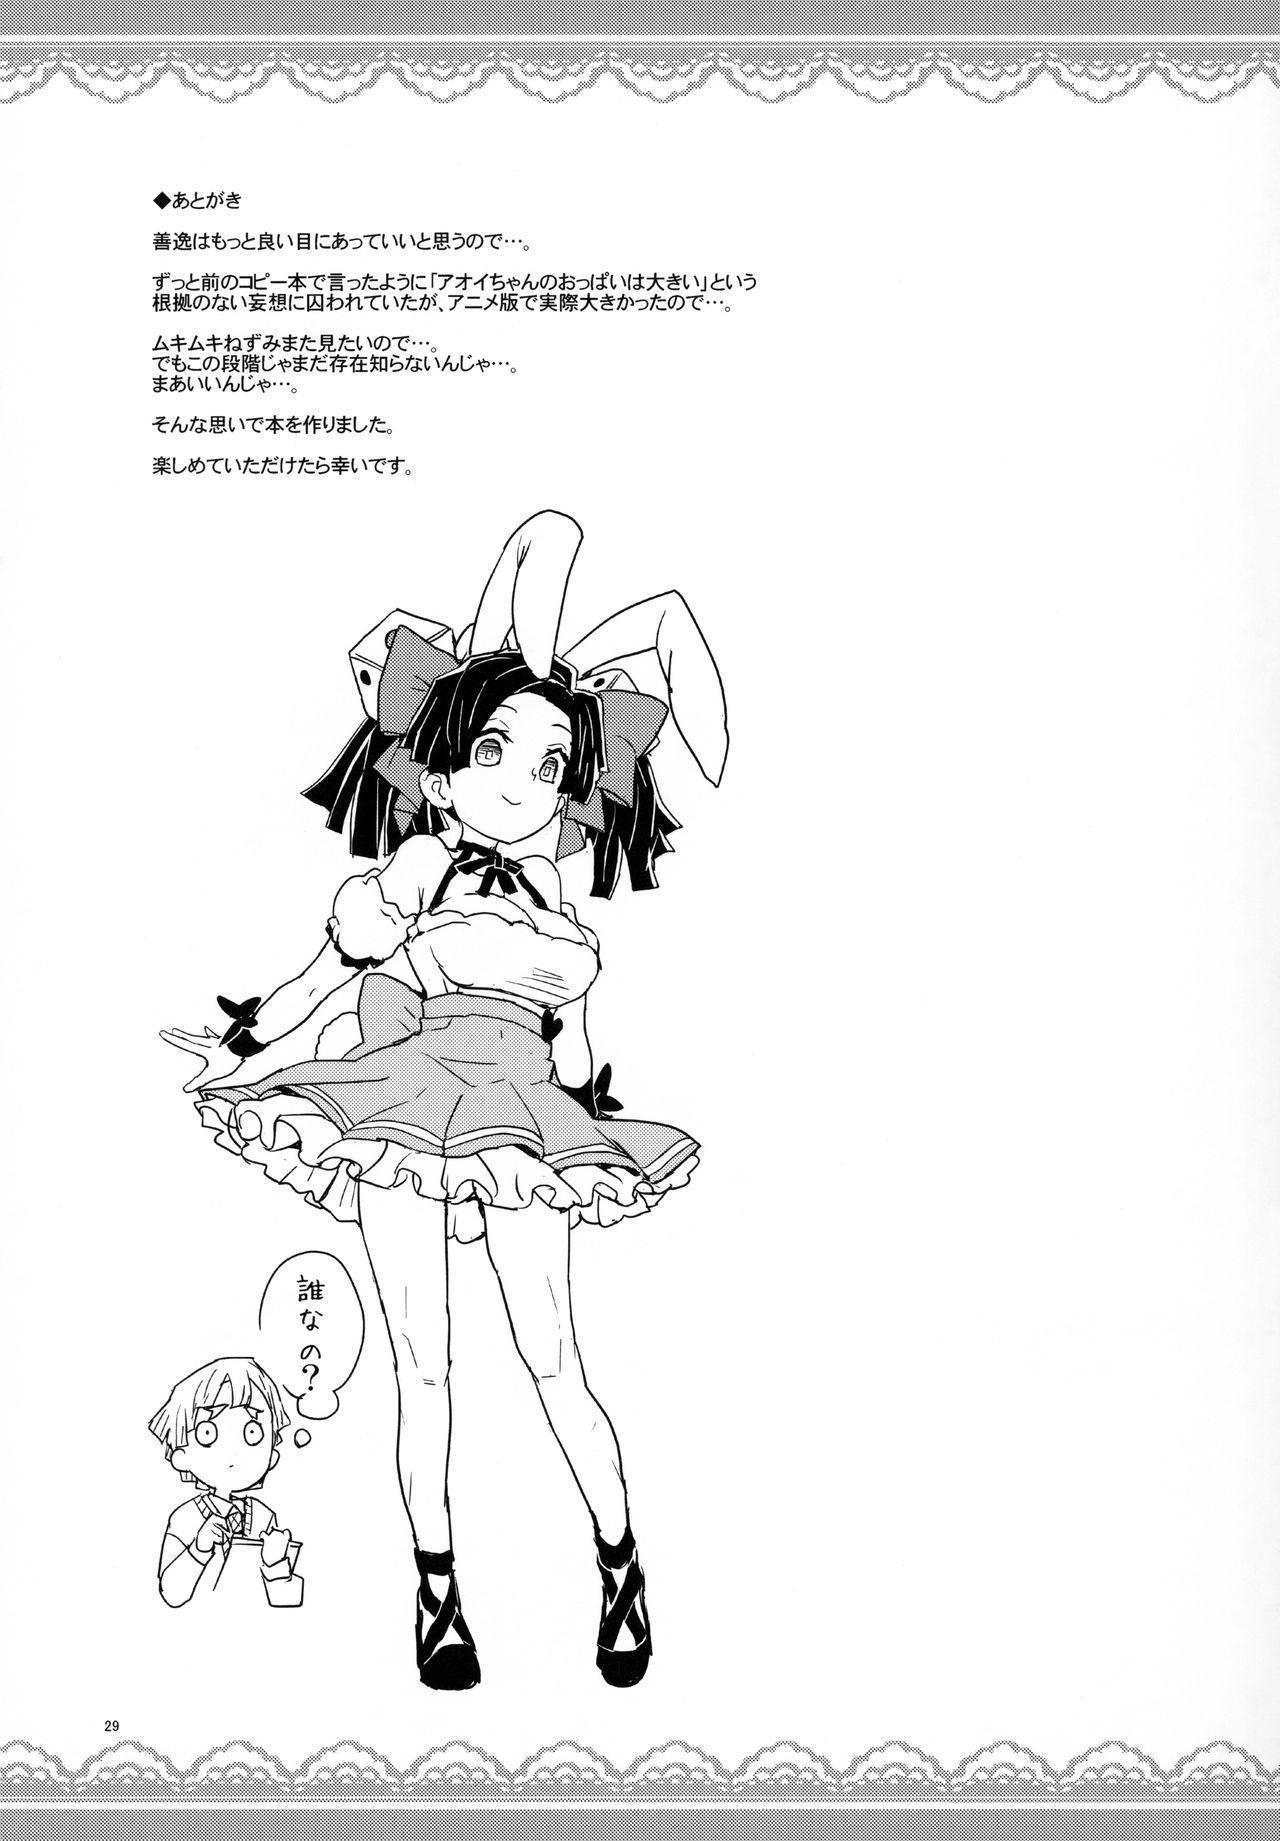 Kanzaki Aoi-chan Arigatou Itsumo Atatakai Kango o Shite Kurete... 27